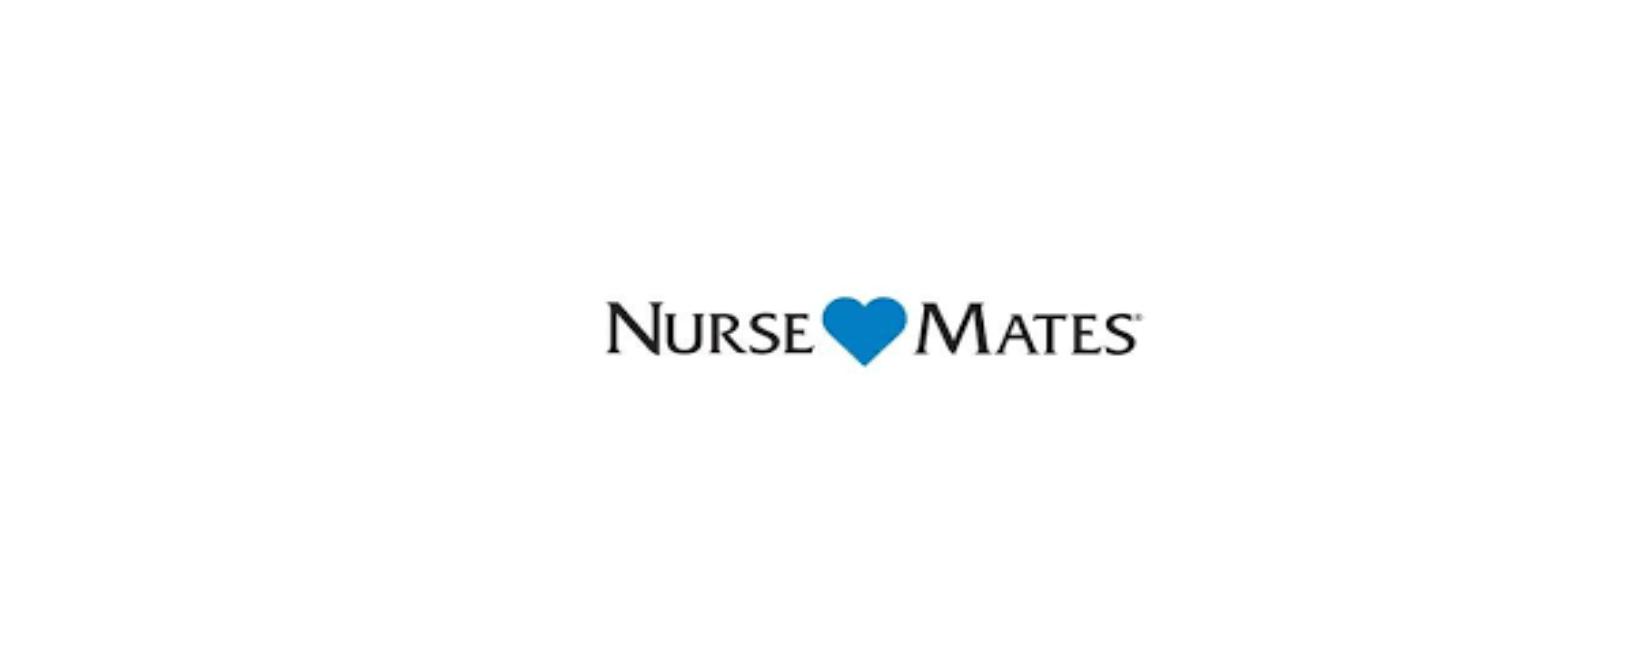 Nurse Mates Discount Code 2021